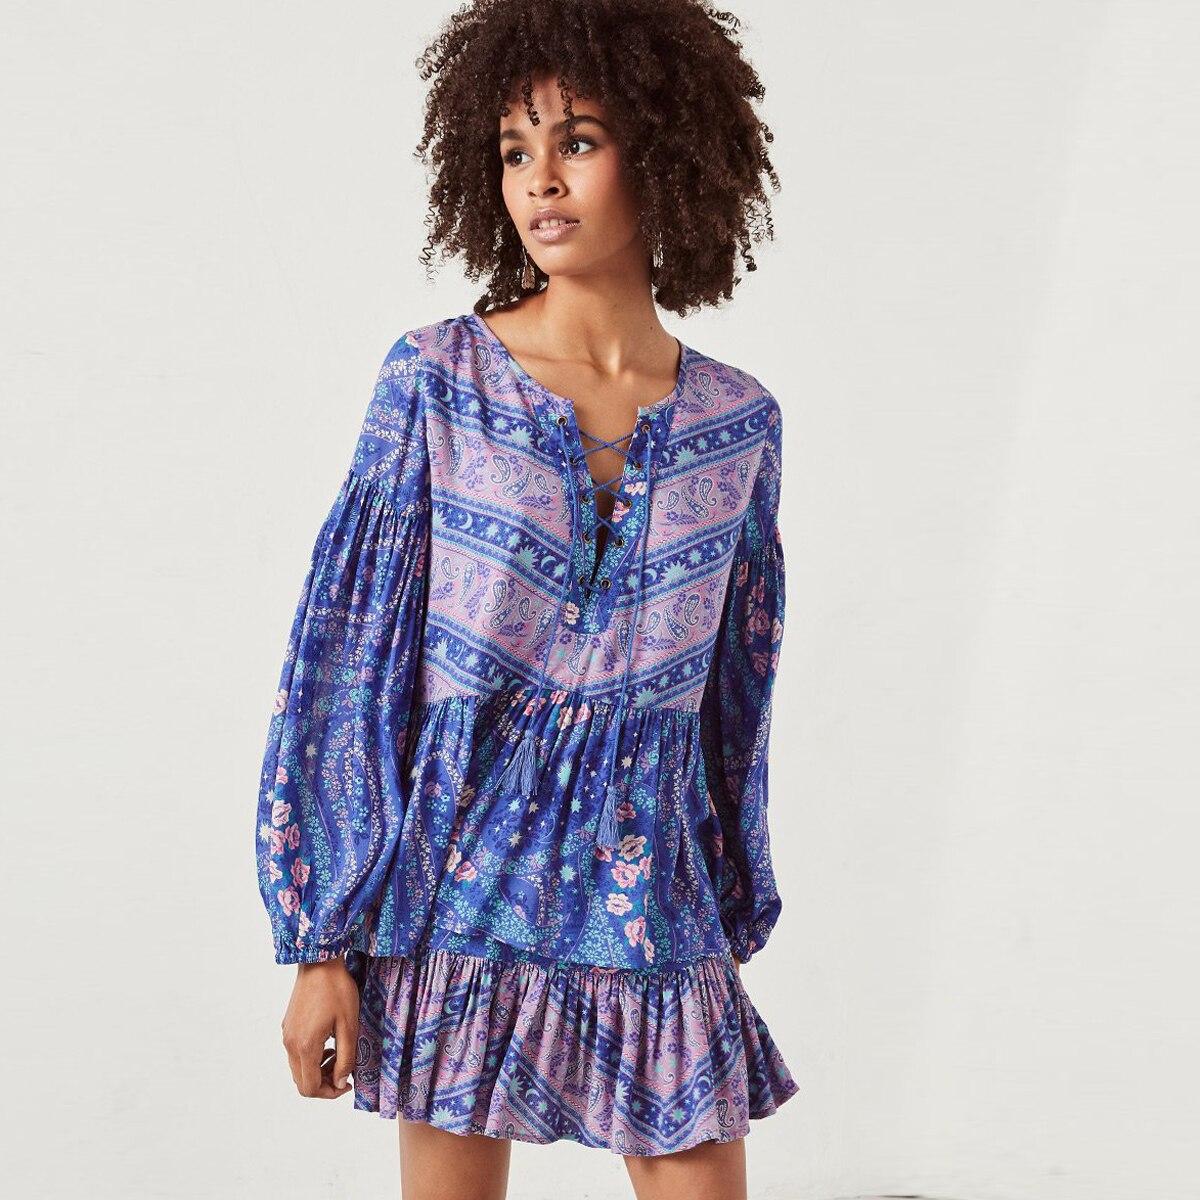 50617f2abc Aliexpress.com : Buy Pirate Curiosity Women 2 Piece Set Dress V Neck Long  Sleeve Mini Dress Boho Hippie Print Dress Casual Beach Dress Vestidos 2018  from ...